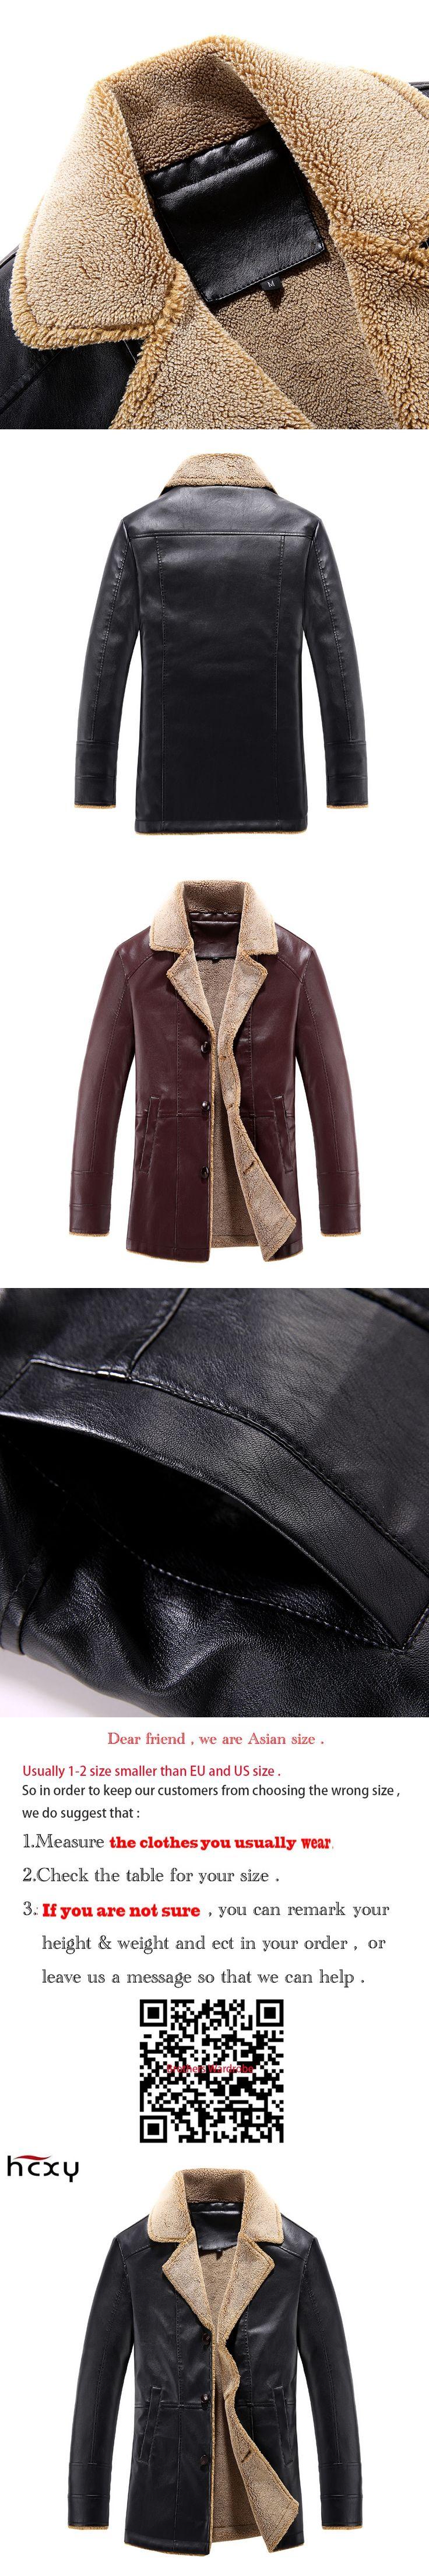 HCXY2017Men's parka winter thick PU jacket male Velvet Coat Lapel Leather Men's coat jaqueta masculino lnverno